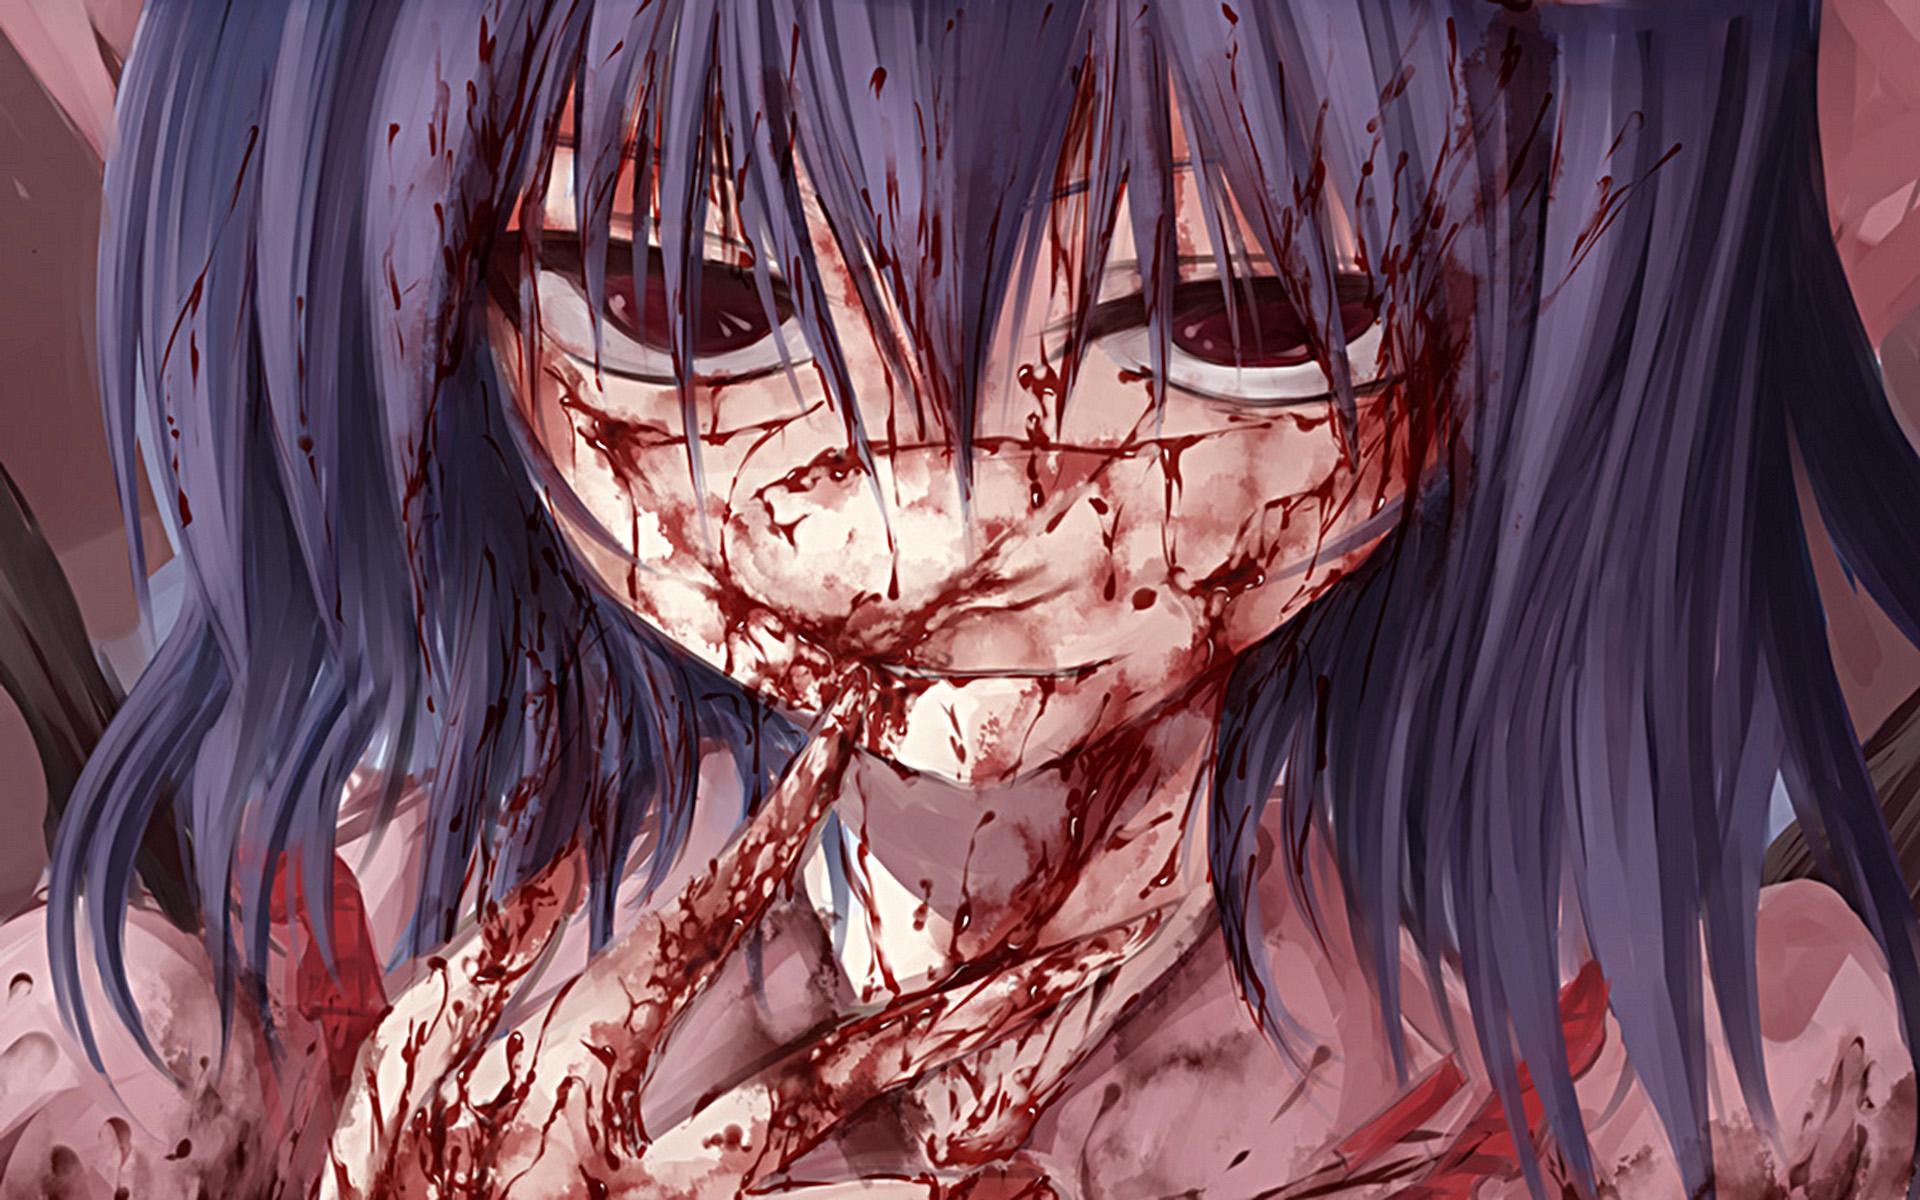 blood anime hd photo 3 - HD Wallpapers Buzz